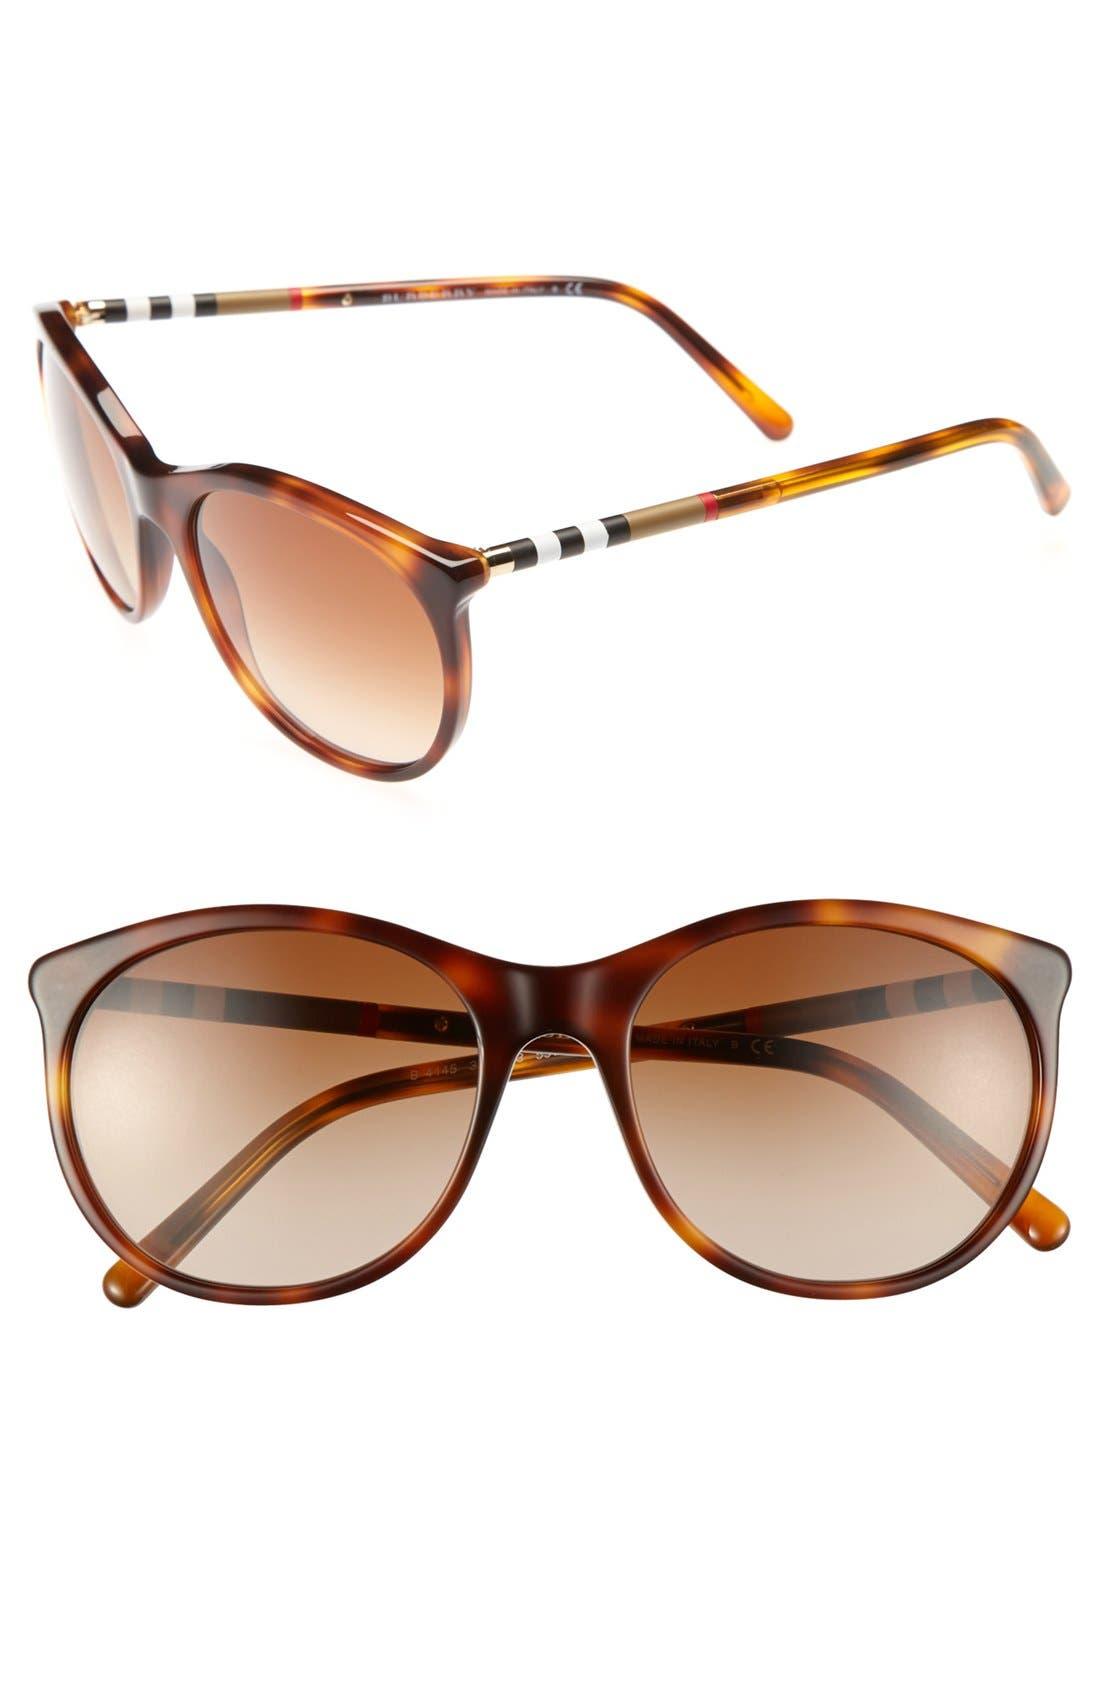 Main Image - Burberry 55mm Cat Eye Sunglasses